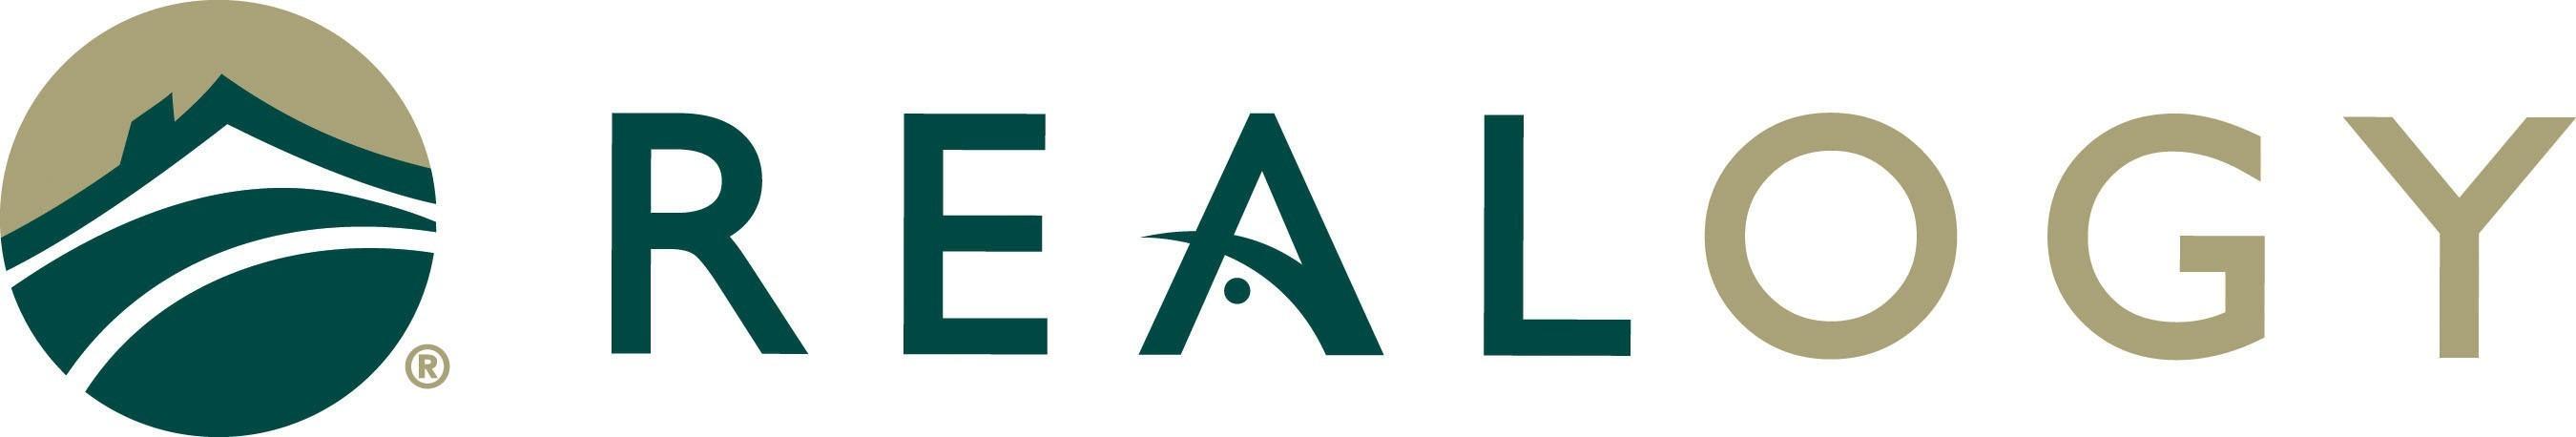 Realogy logo.  (PRNewsFoto/Realogy Holdings Corp.) (PRNewsfoto/Realogy Holdings Corp.)